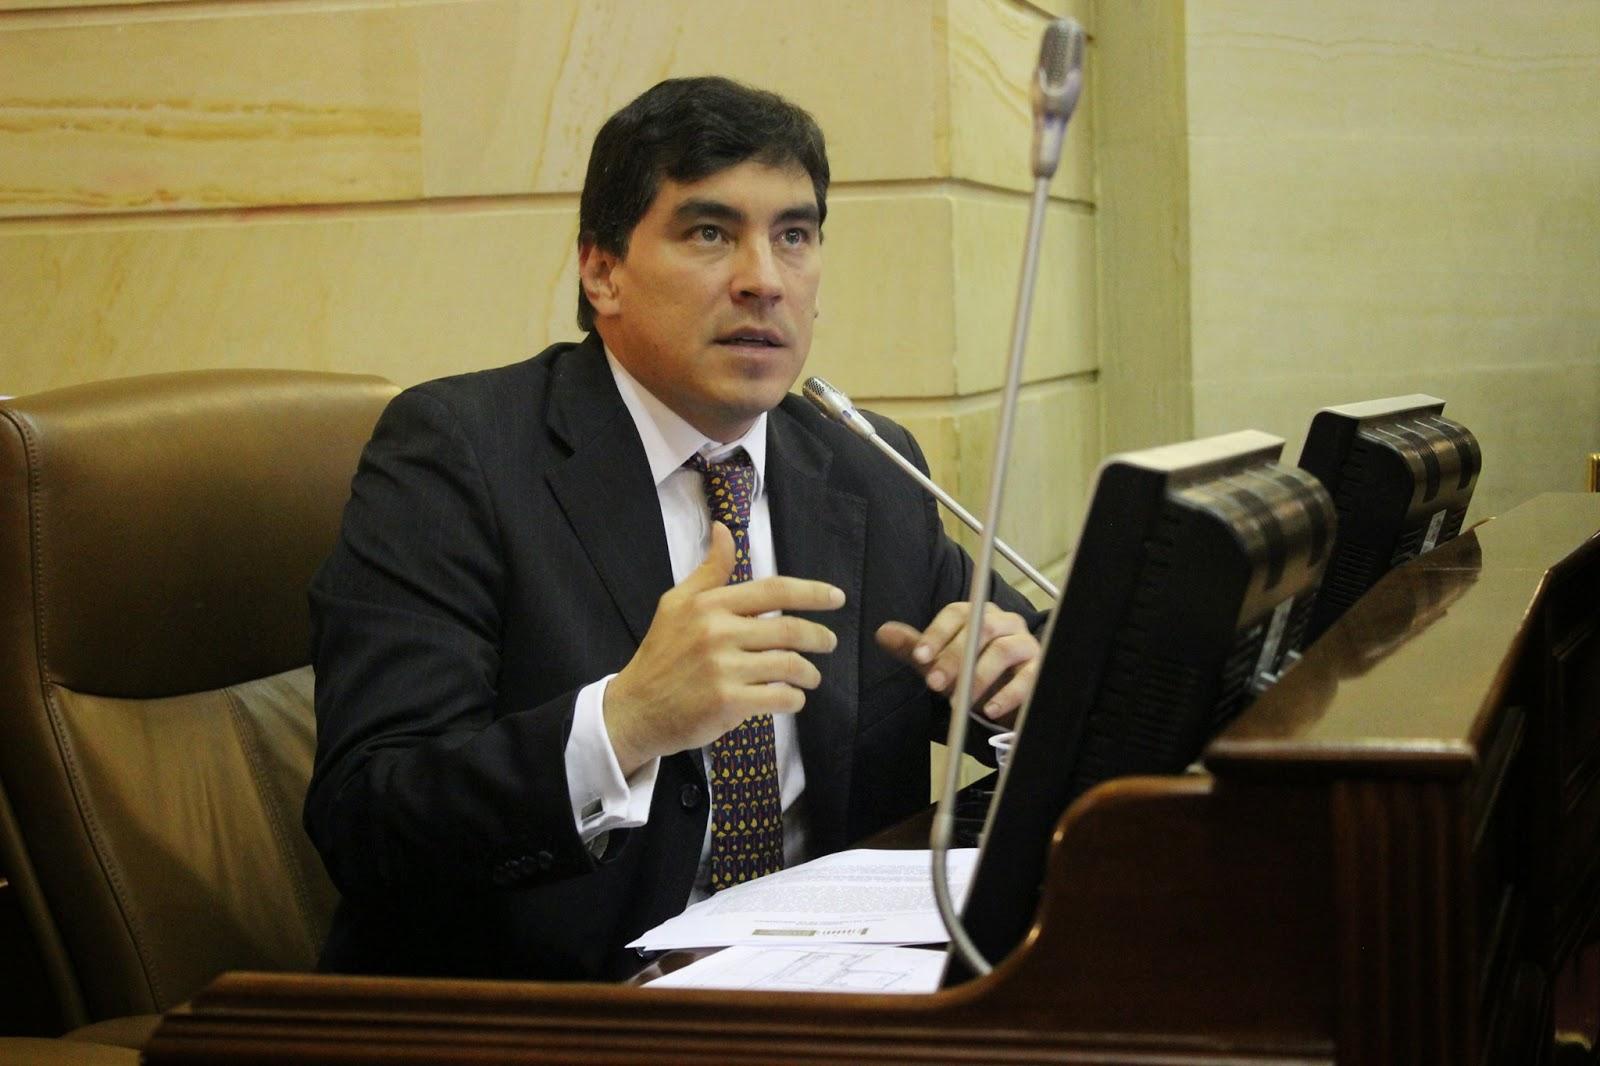 Álvaro Hernán Prada